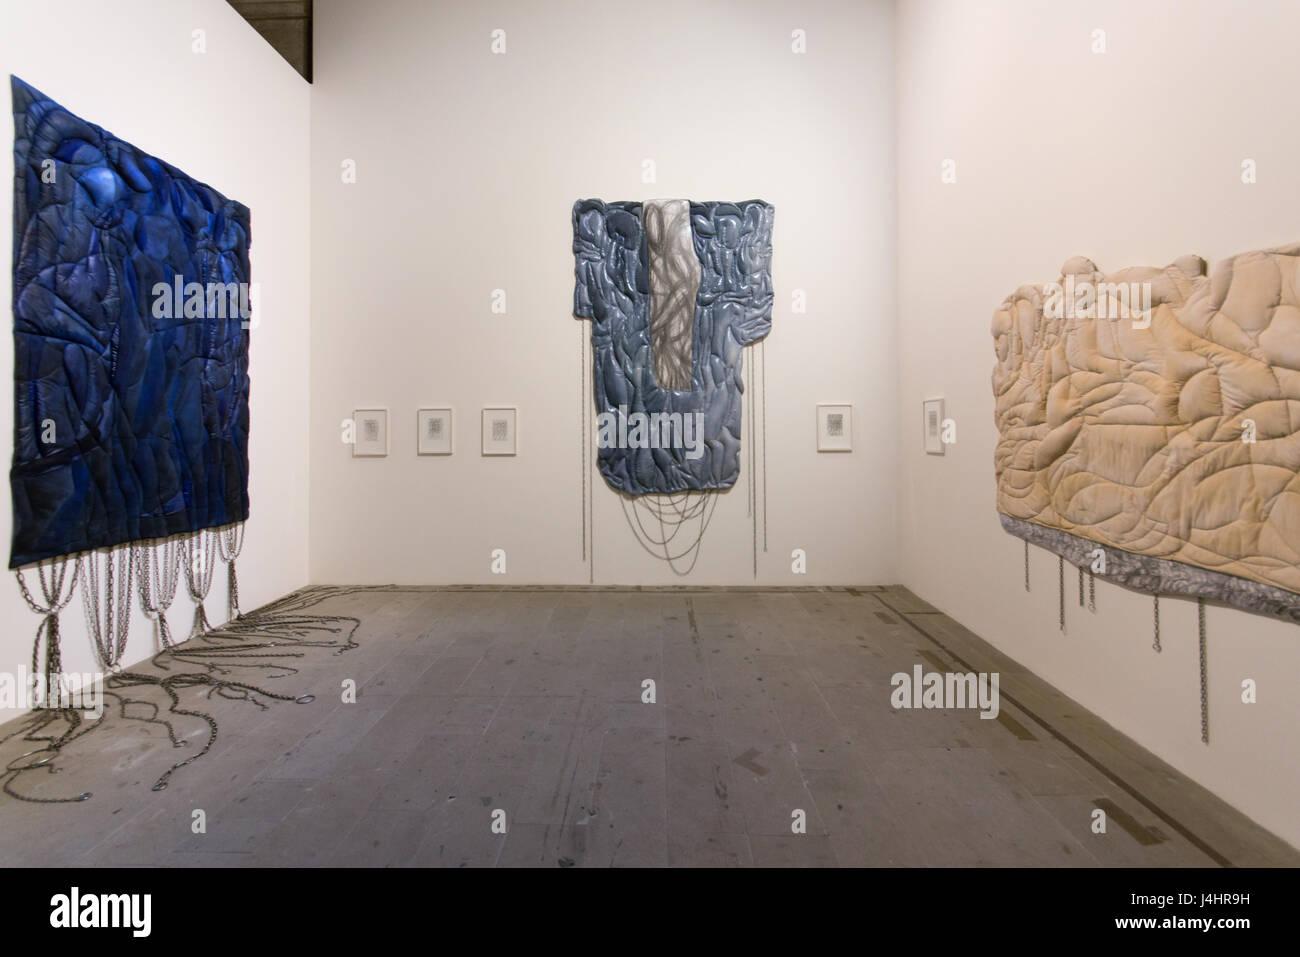 Rasheed Araeen, Zero to Infinity, installation, Venice Art Biennale 2017, core exhibition at Arsenale, Inexhibit - Stock Image